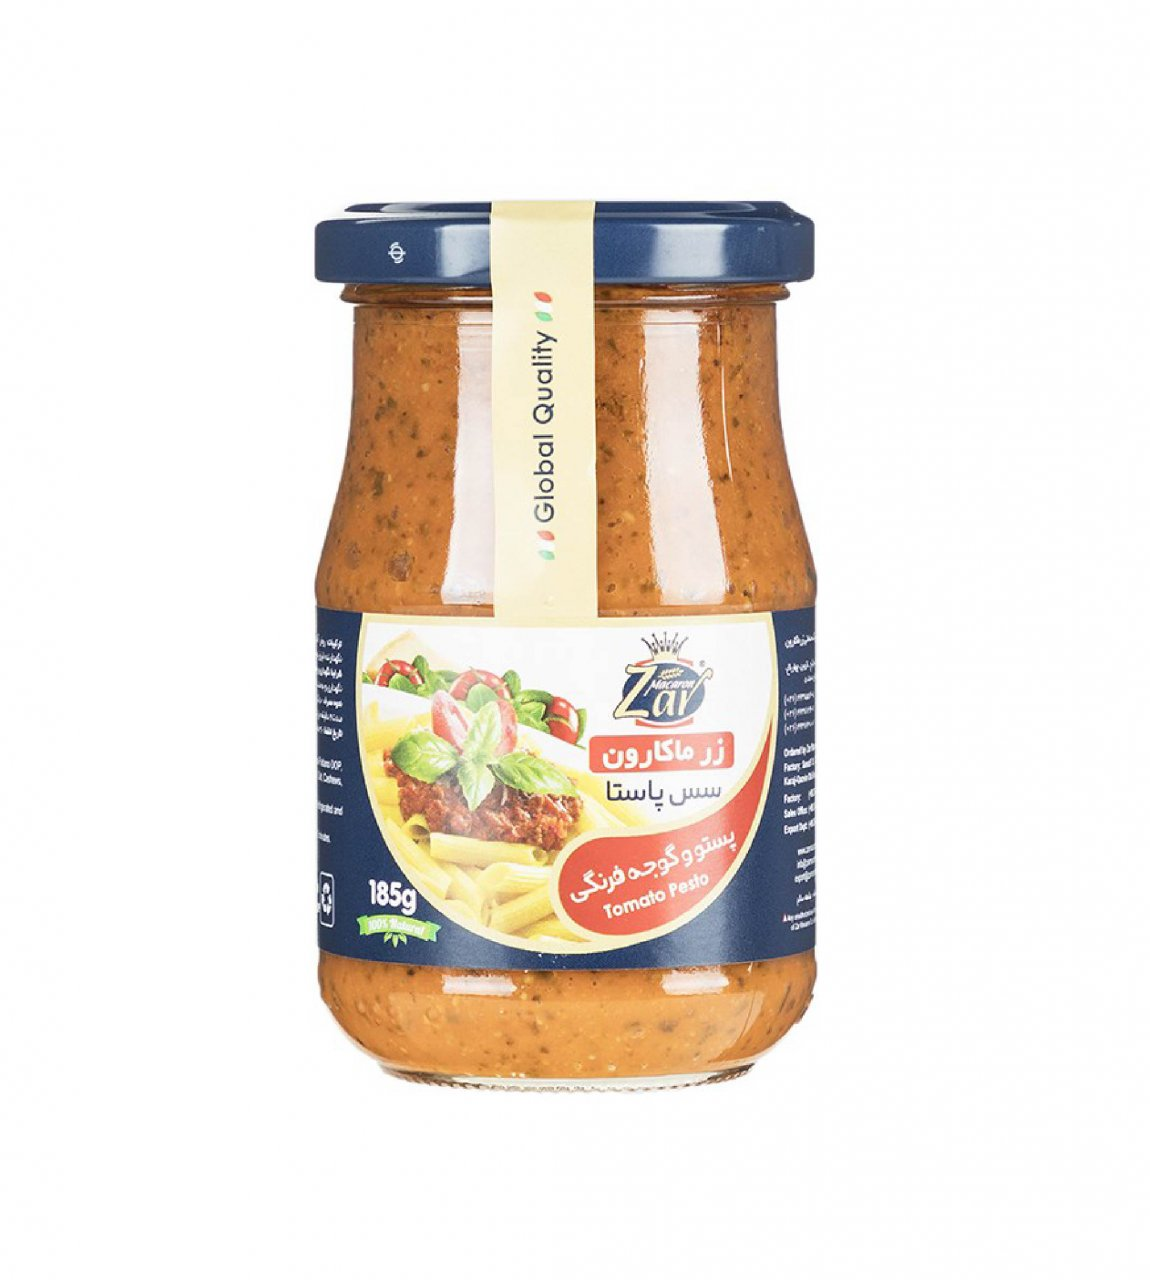 سس پاستا پستو و گوجه فرنگی زر ماکارون 185 گرم